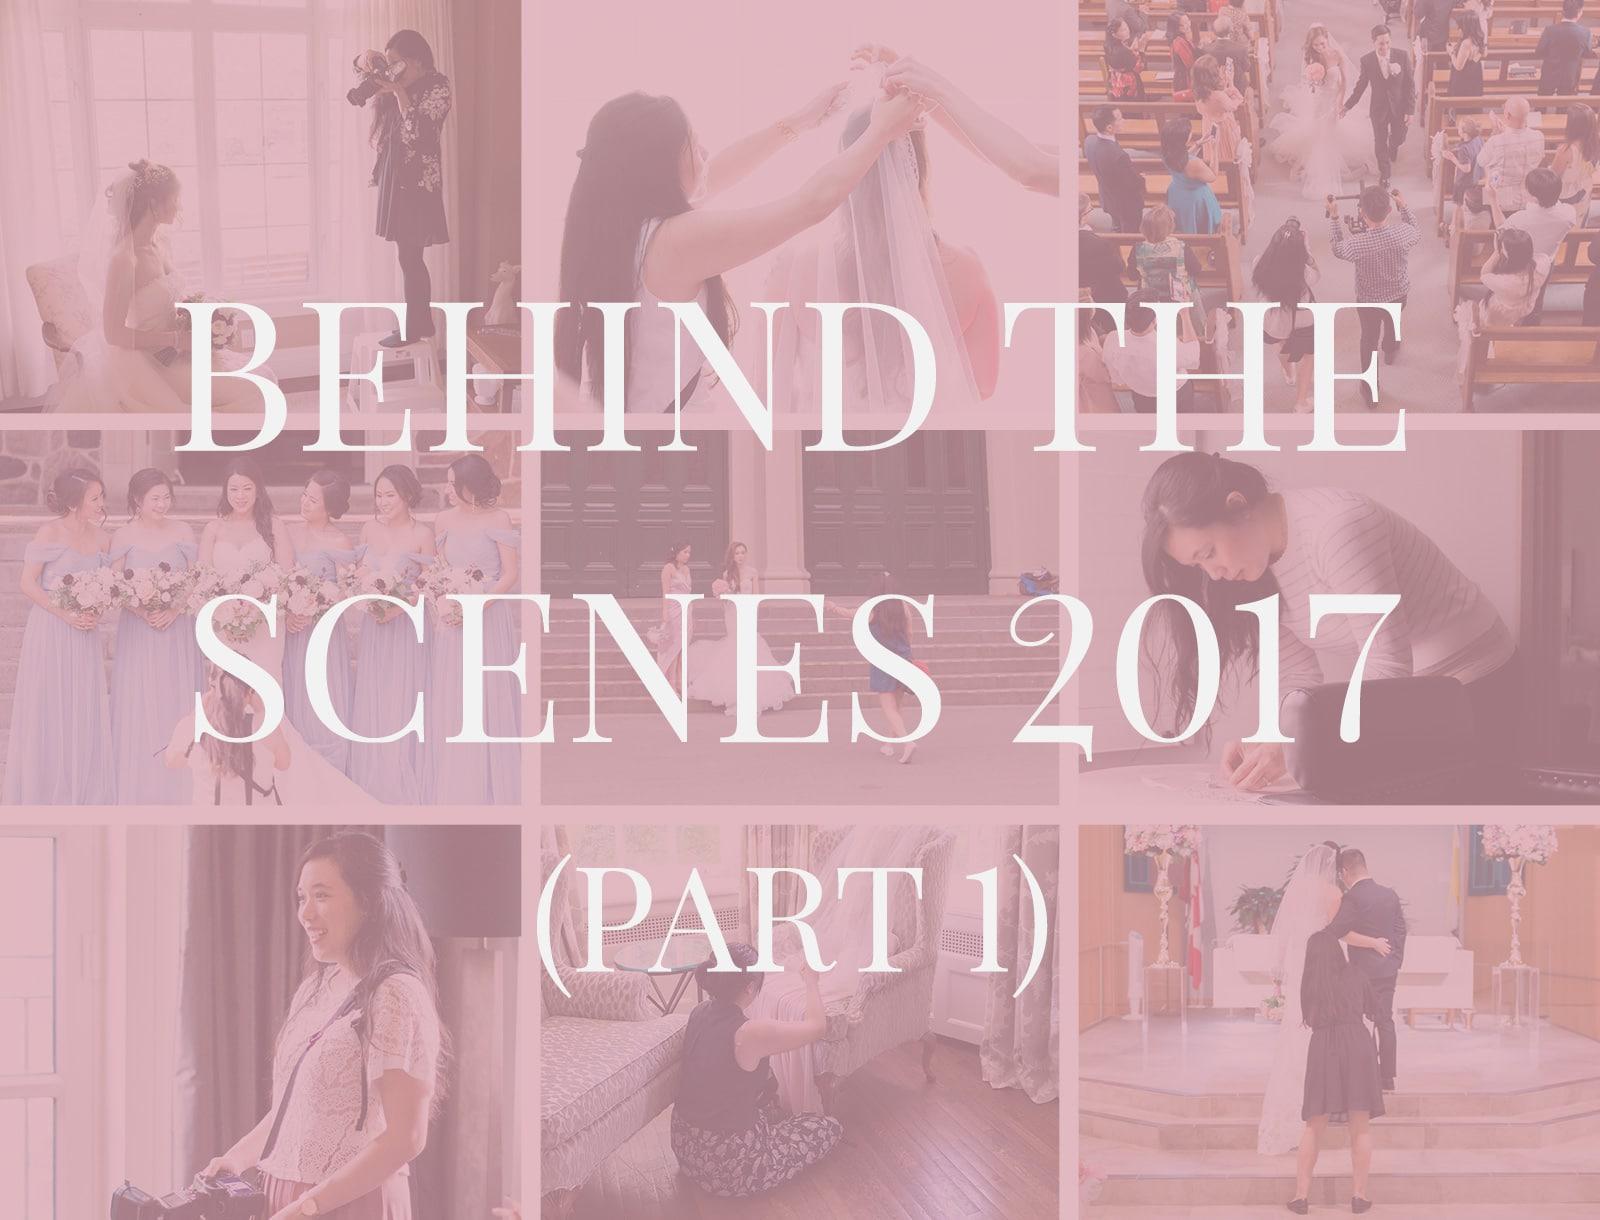 Behind The Scenes 2017 (Part 1)